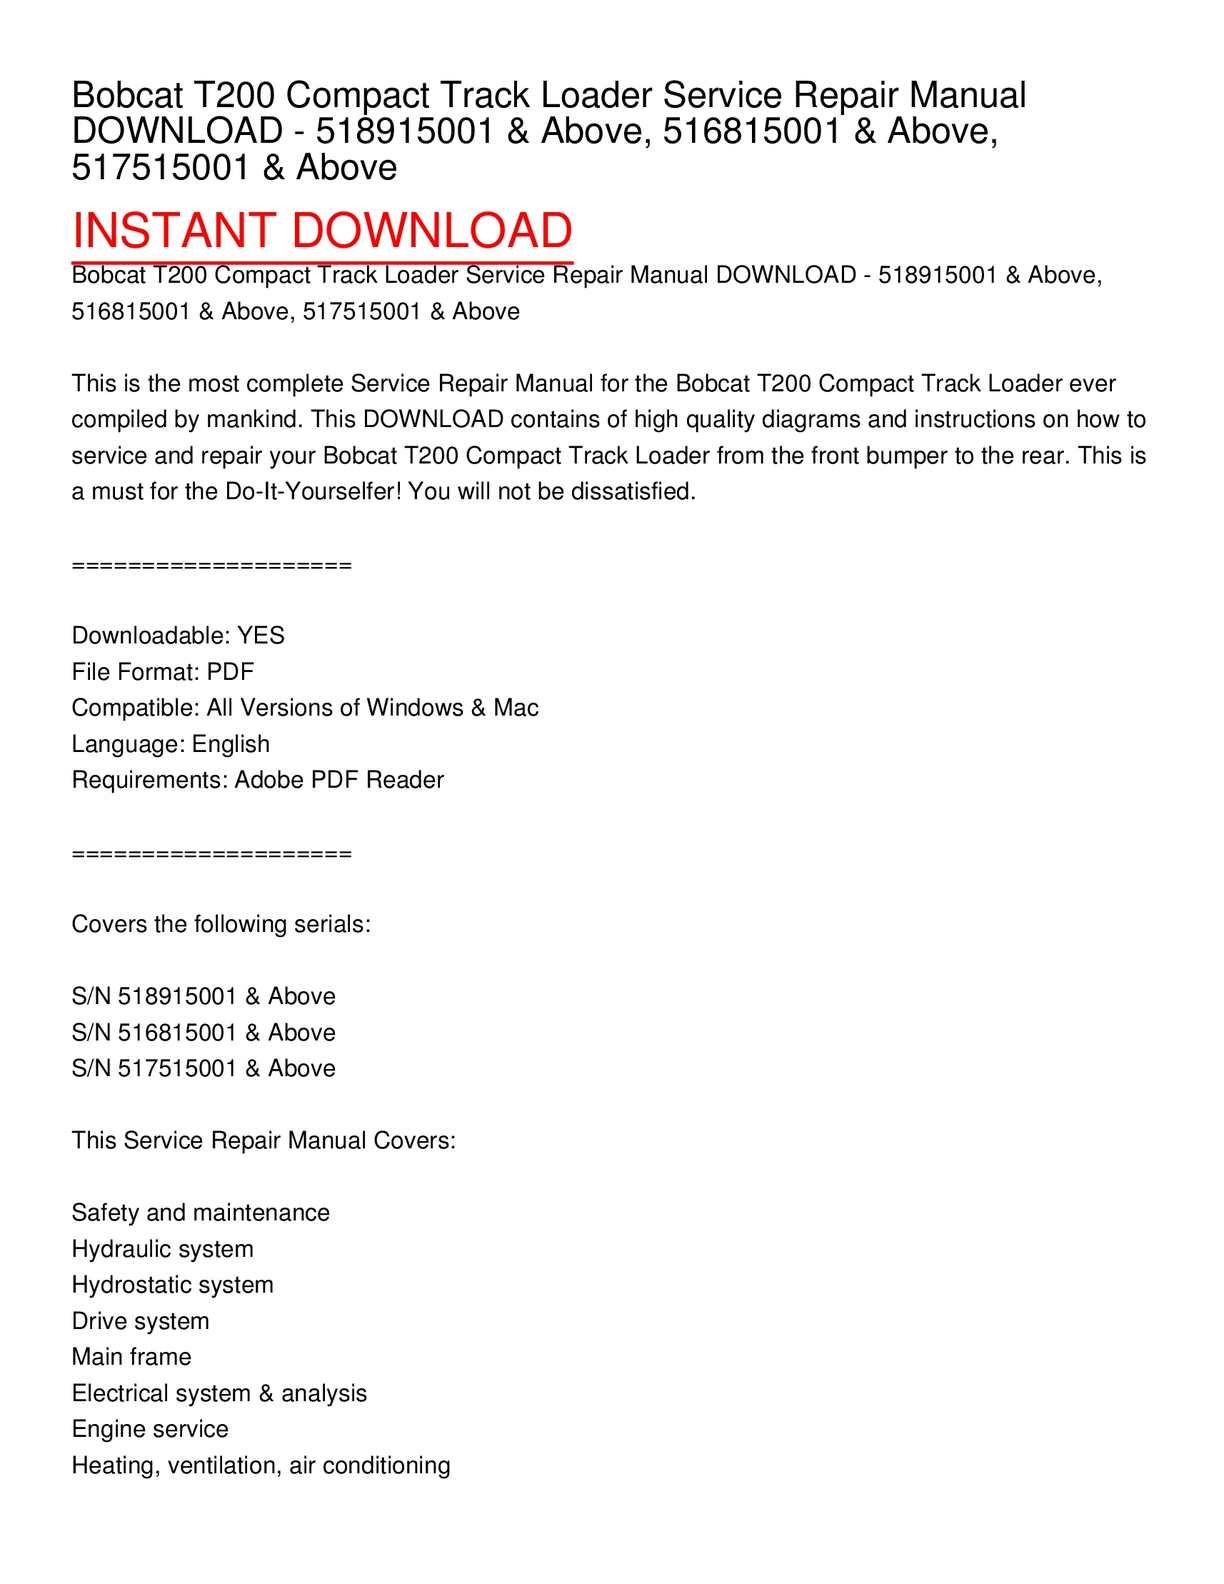 Bobcat T200 Wiring Diagram Online Schematics Fuse Box Location Calamo Compact Track Loader Service Repair Manual Solenoid Schematic